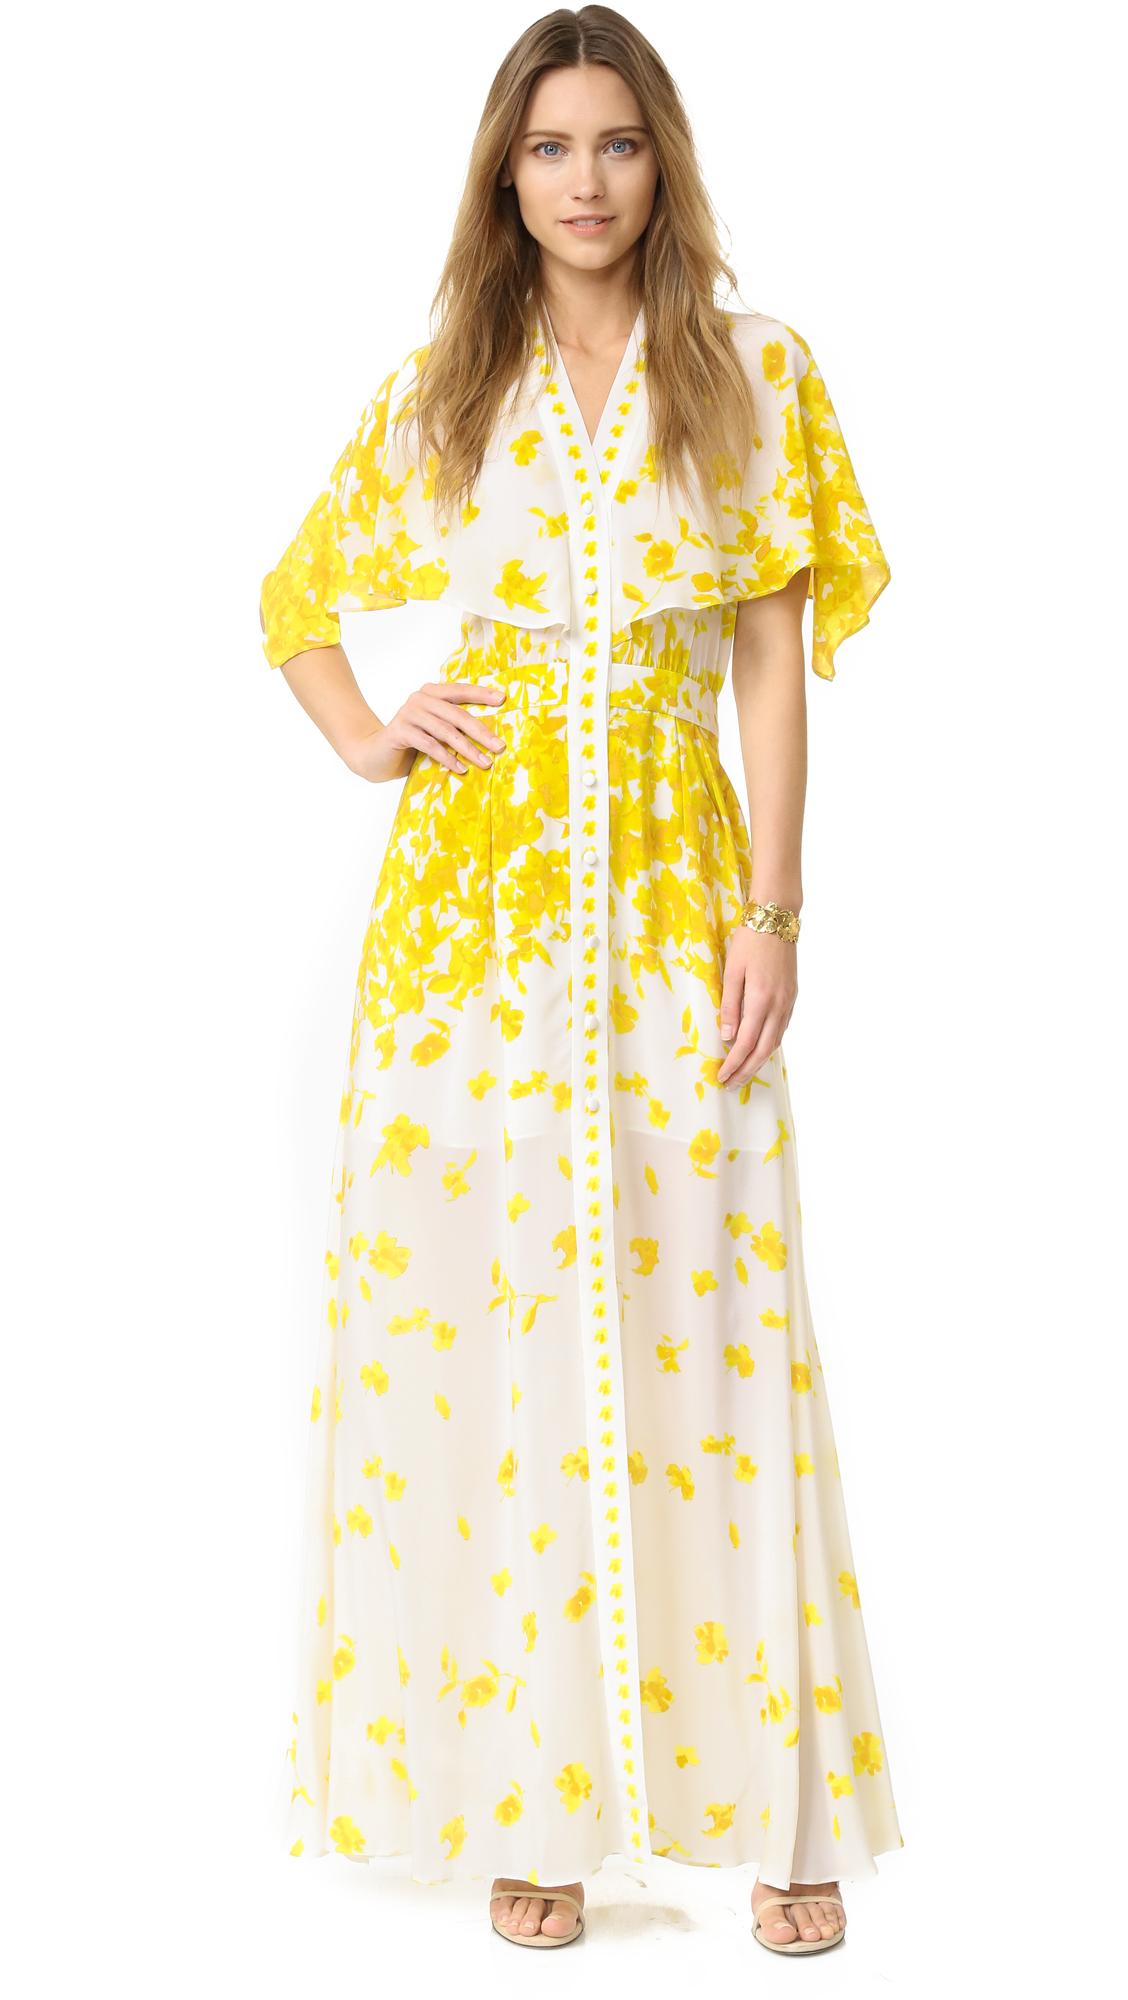 610abc90c4df Alexis Jeannie Silk Dress in Yellow - Lyst